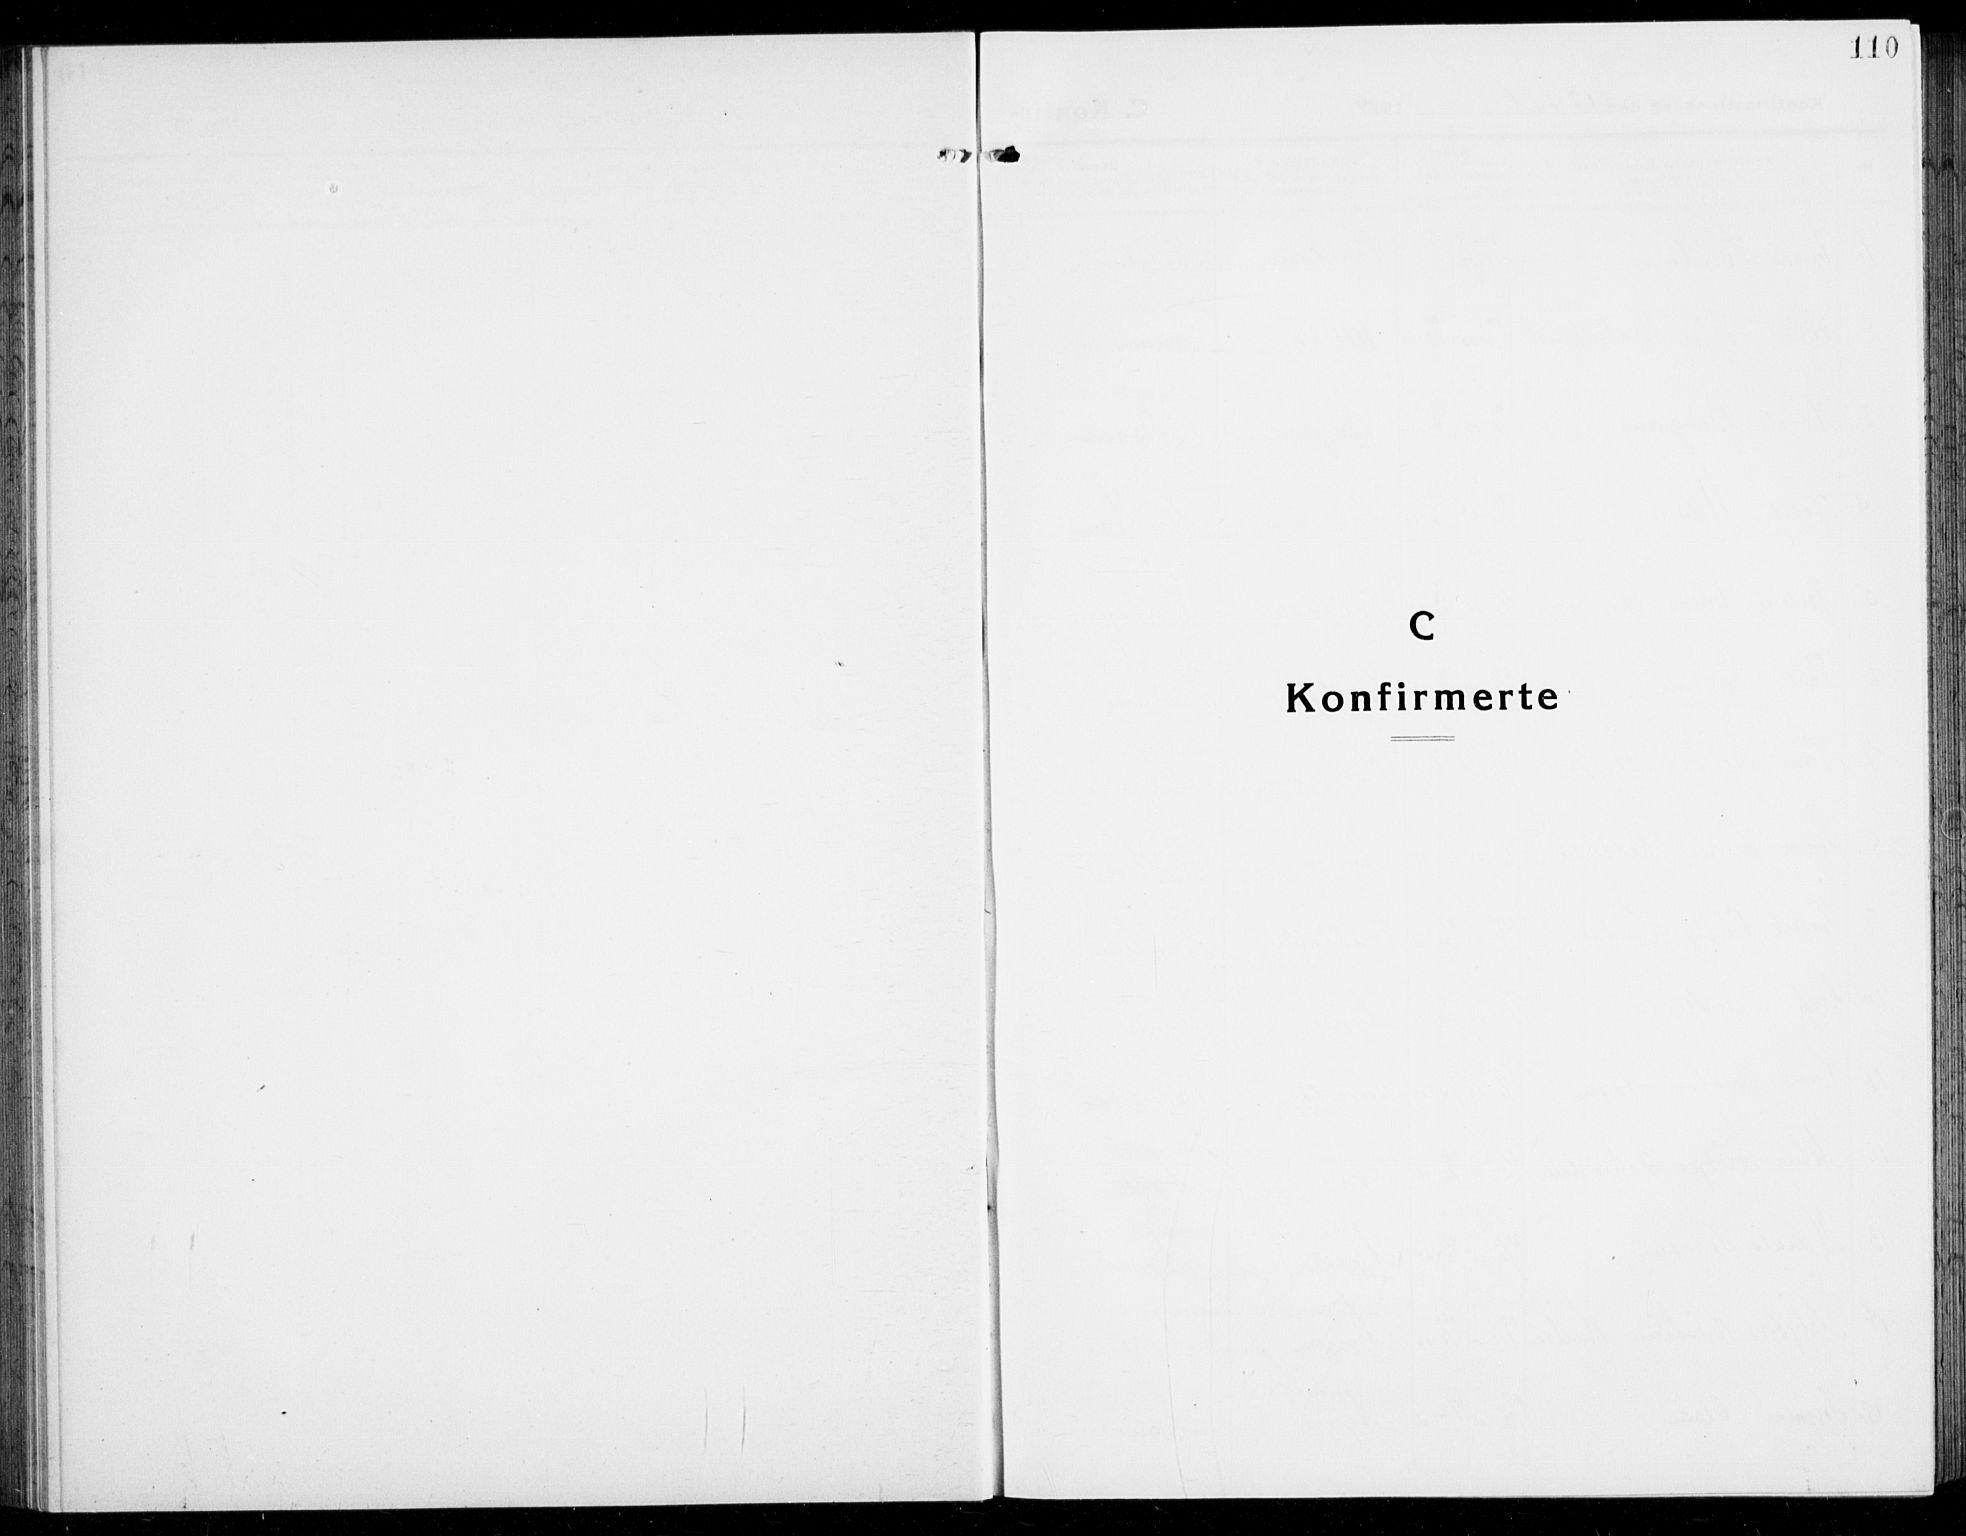 SAKO, Brunlanes kirkebøker, G/Ga/L0005: Parish register (copy) no. I 5, 1918-1941, p. 110